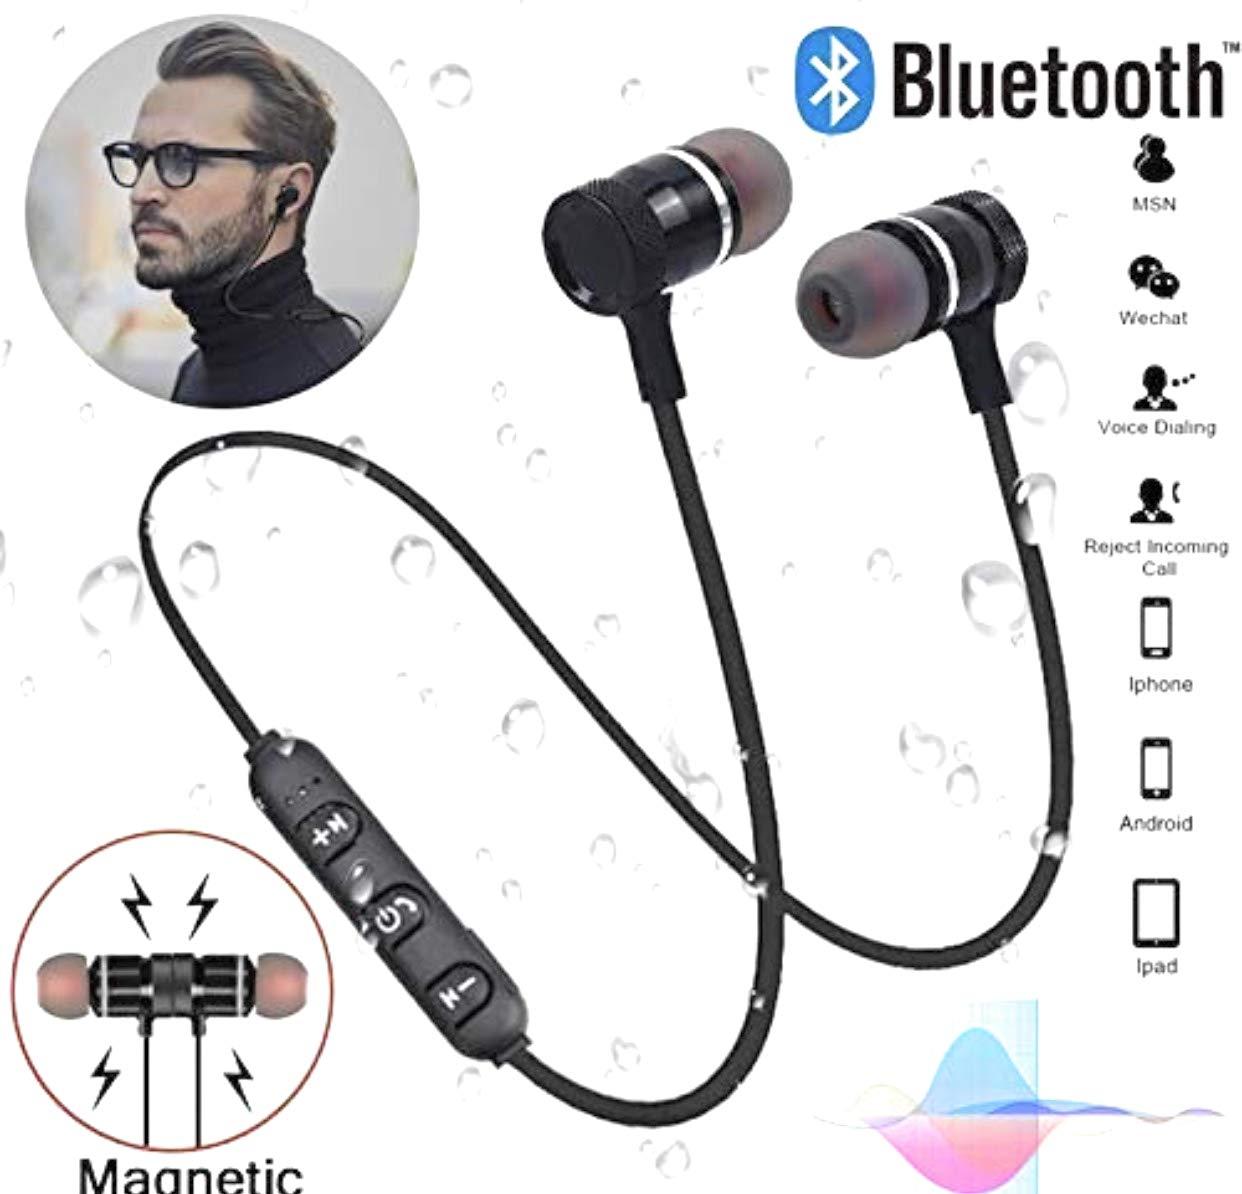 Syska Compatible Bluetooth Headphone Wireless Earphone with Mic Model H15 (B07KXR33Y8) Amazon Price History, Amazon Price Tracker